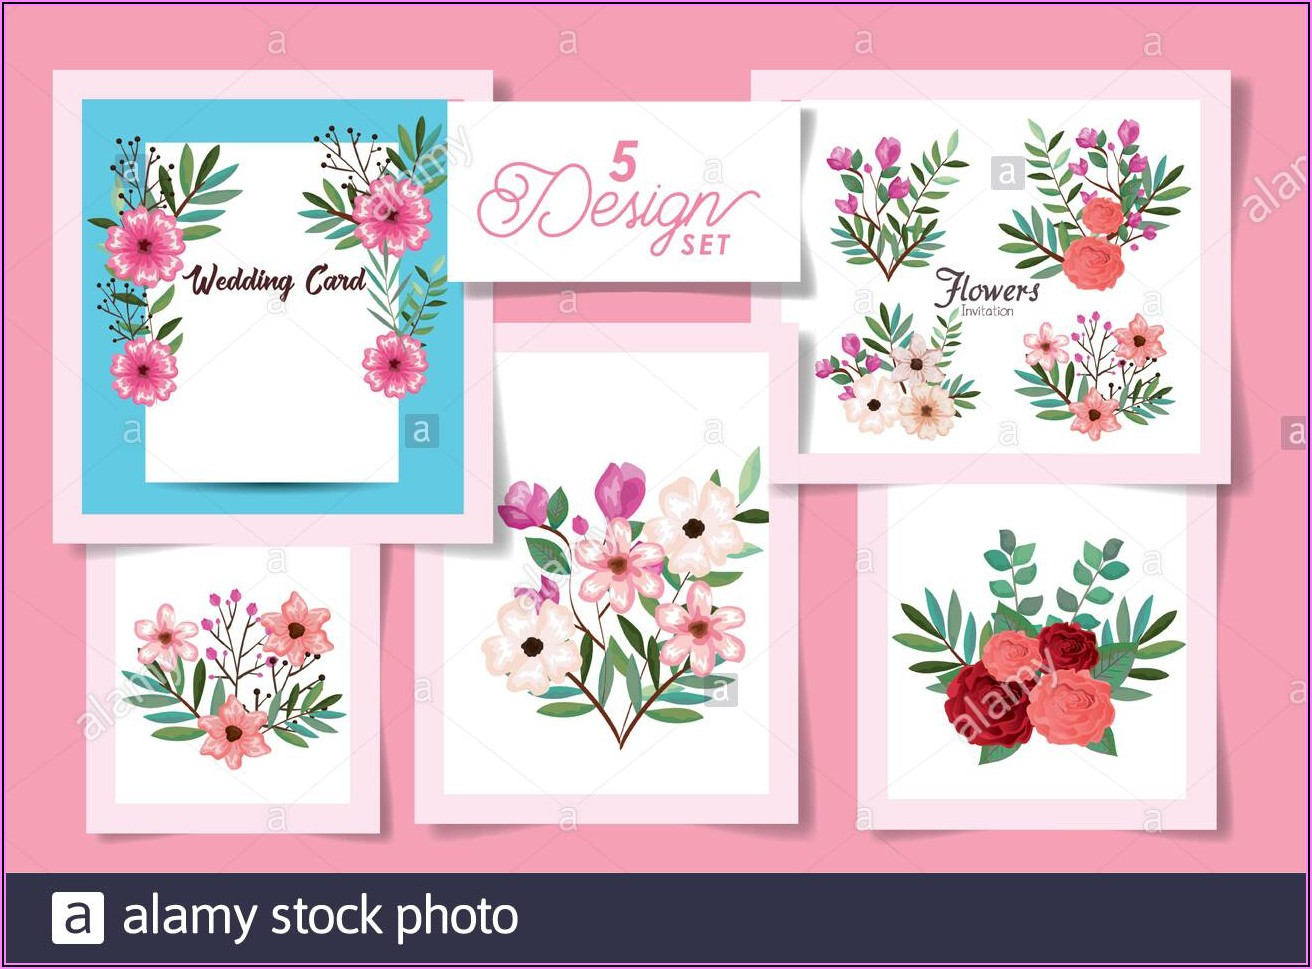 Flowers Wedding Invitation Designs